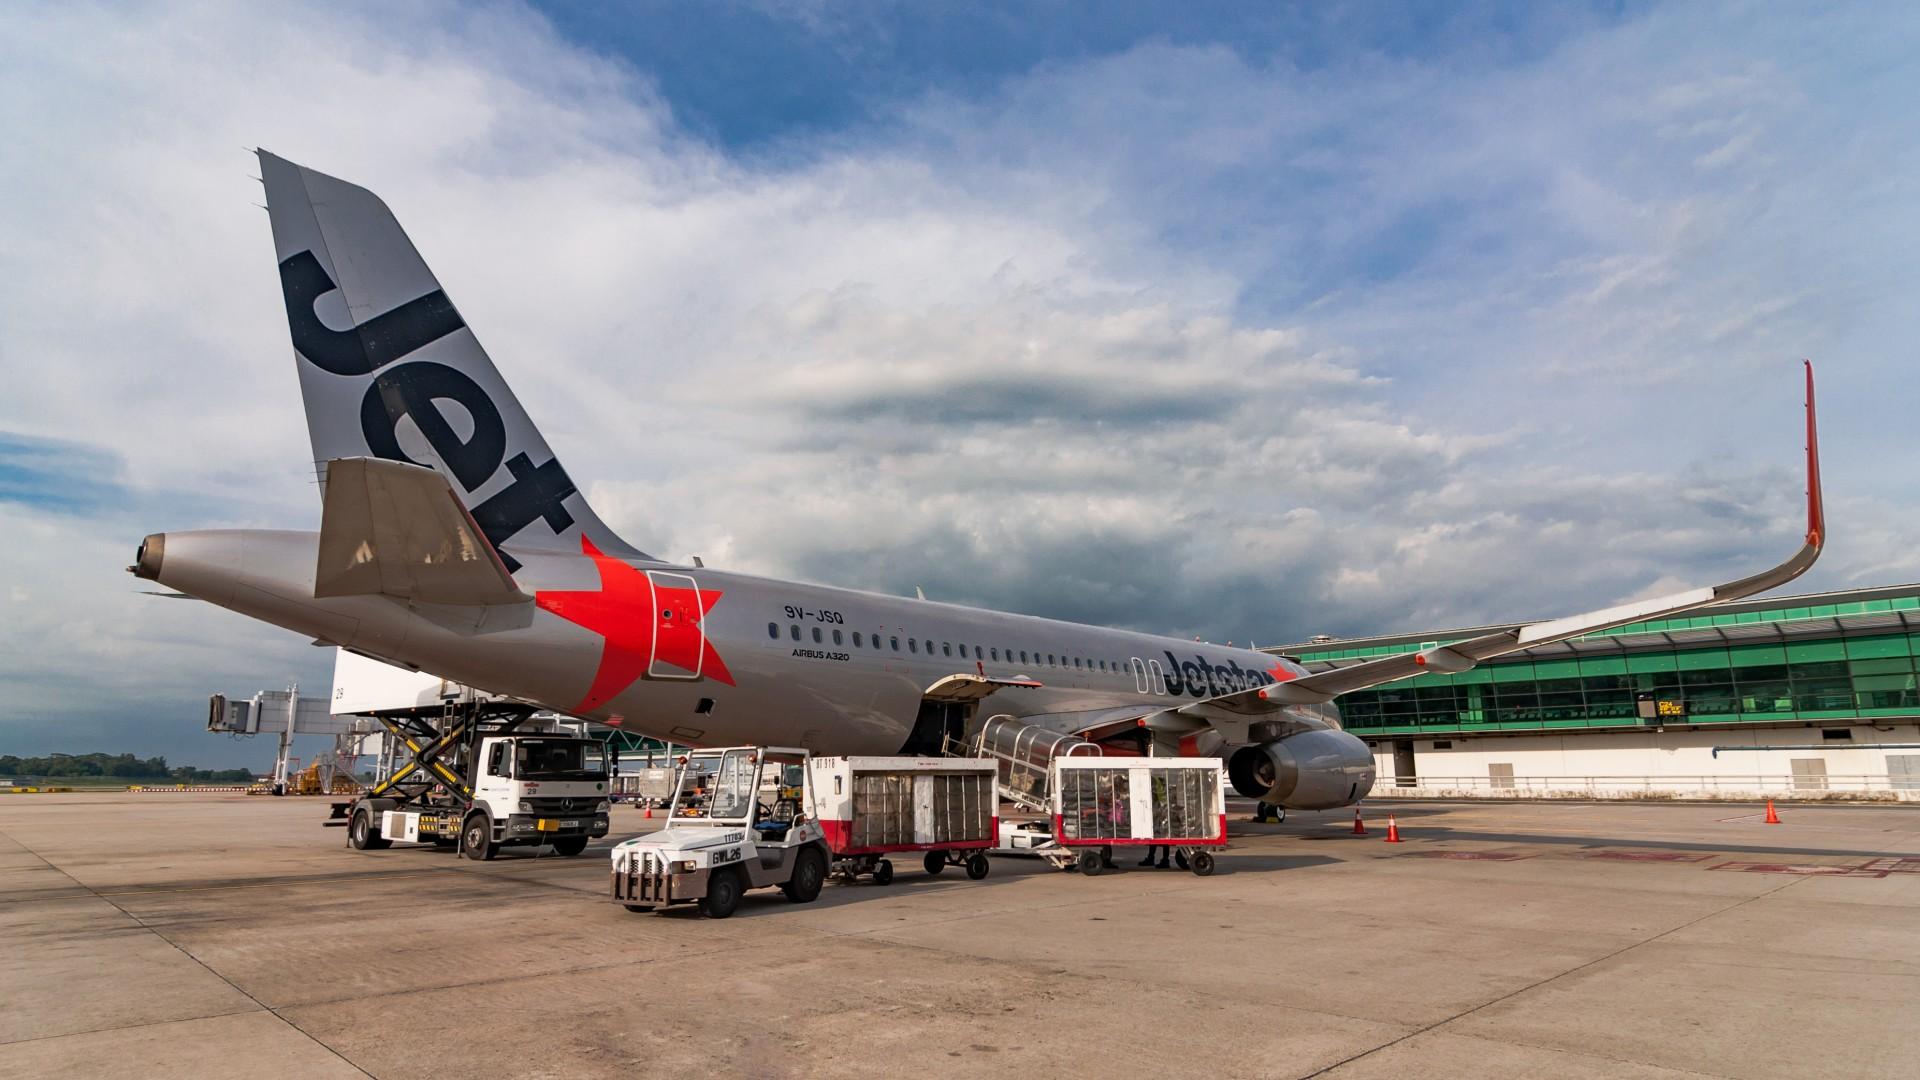 Kết quả hình ảnh cho Jetstar Asia with Low-carbon images